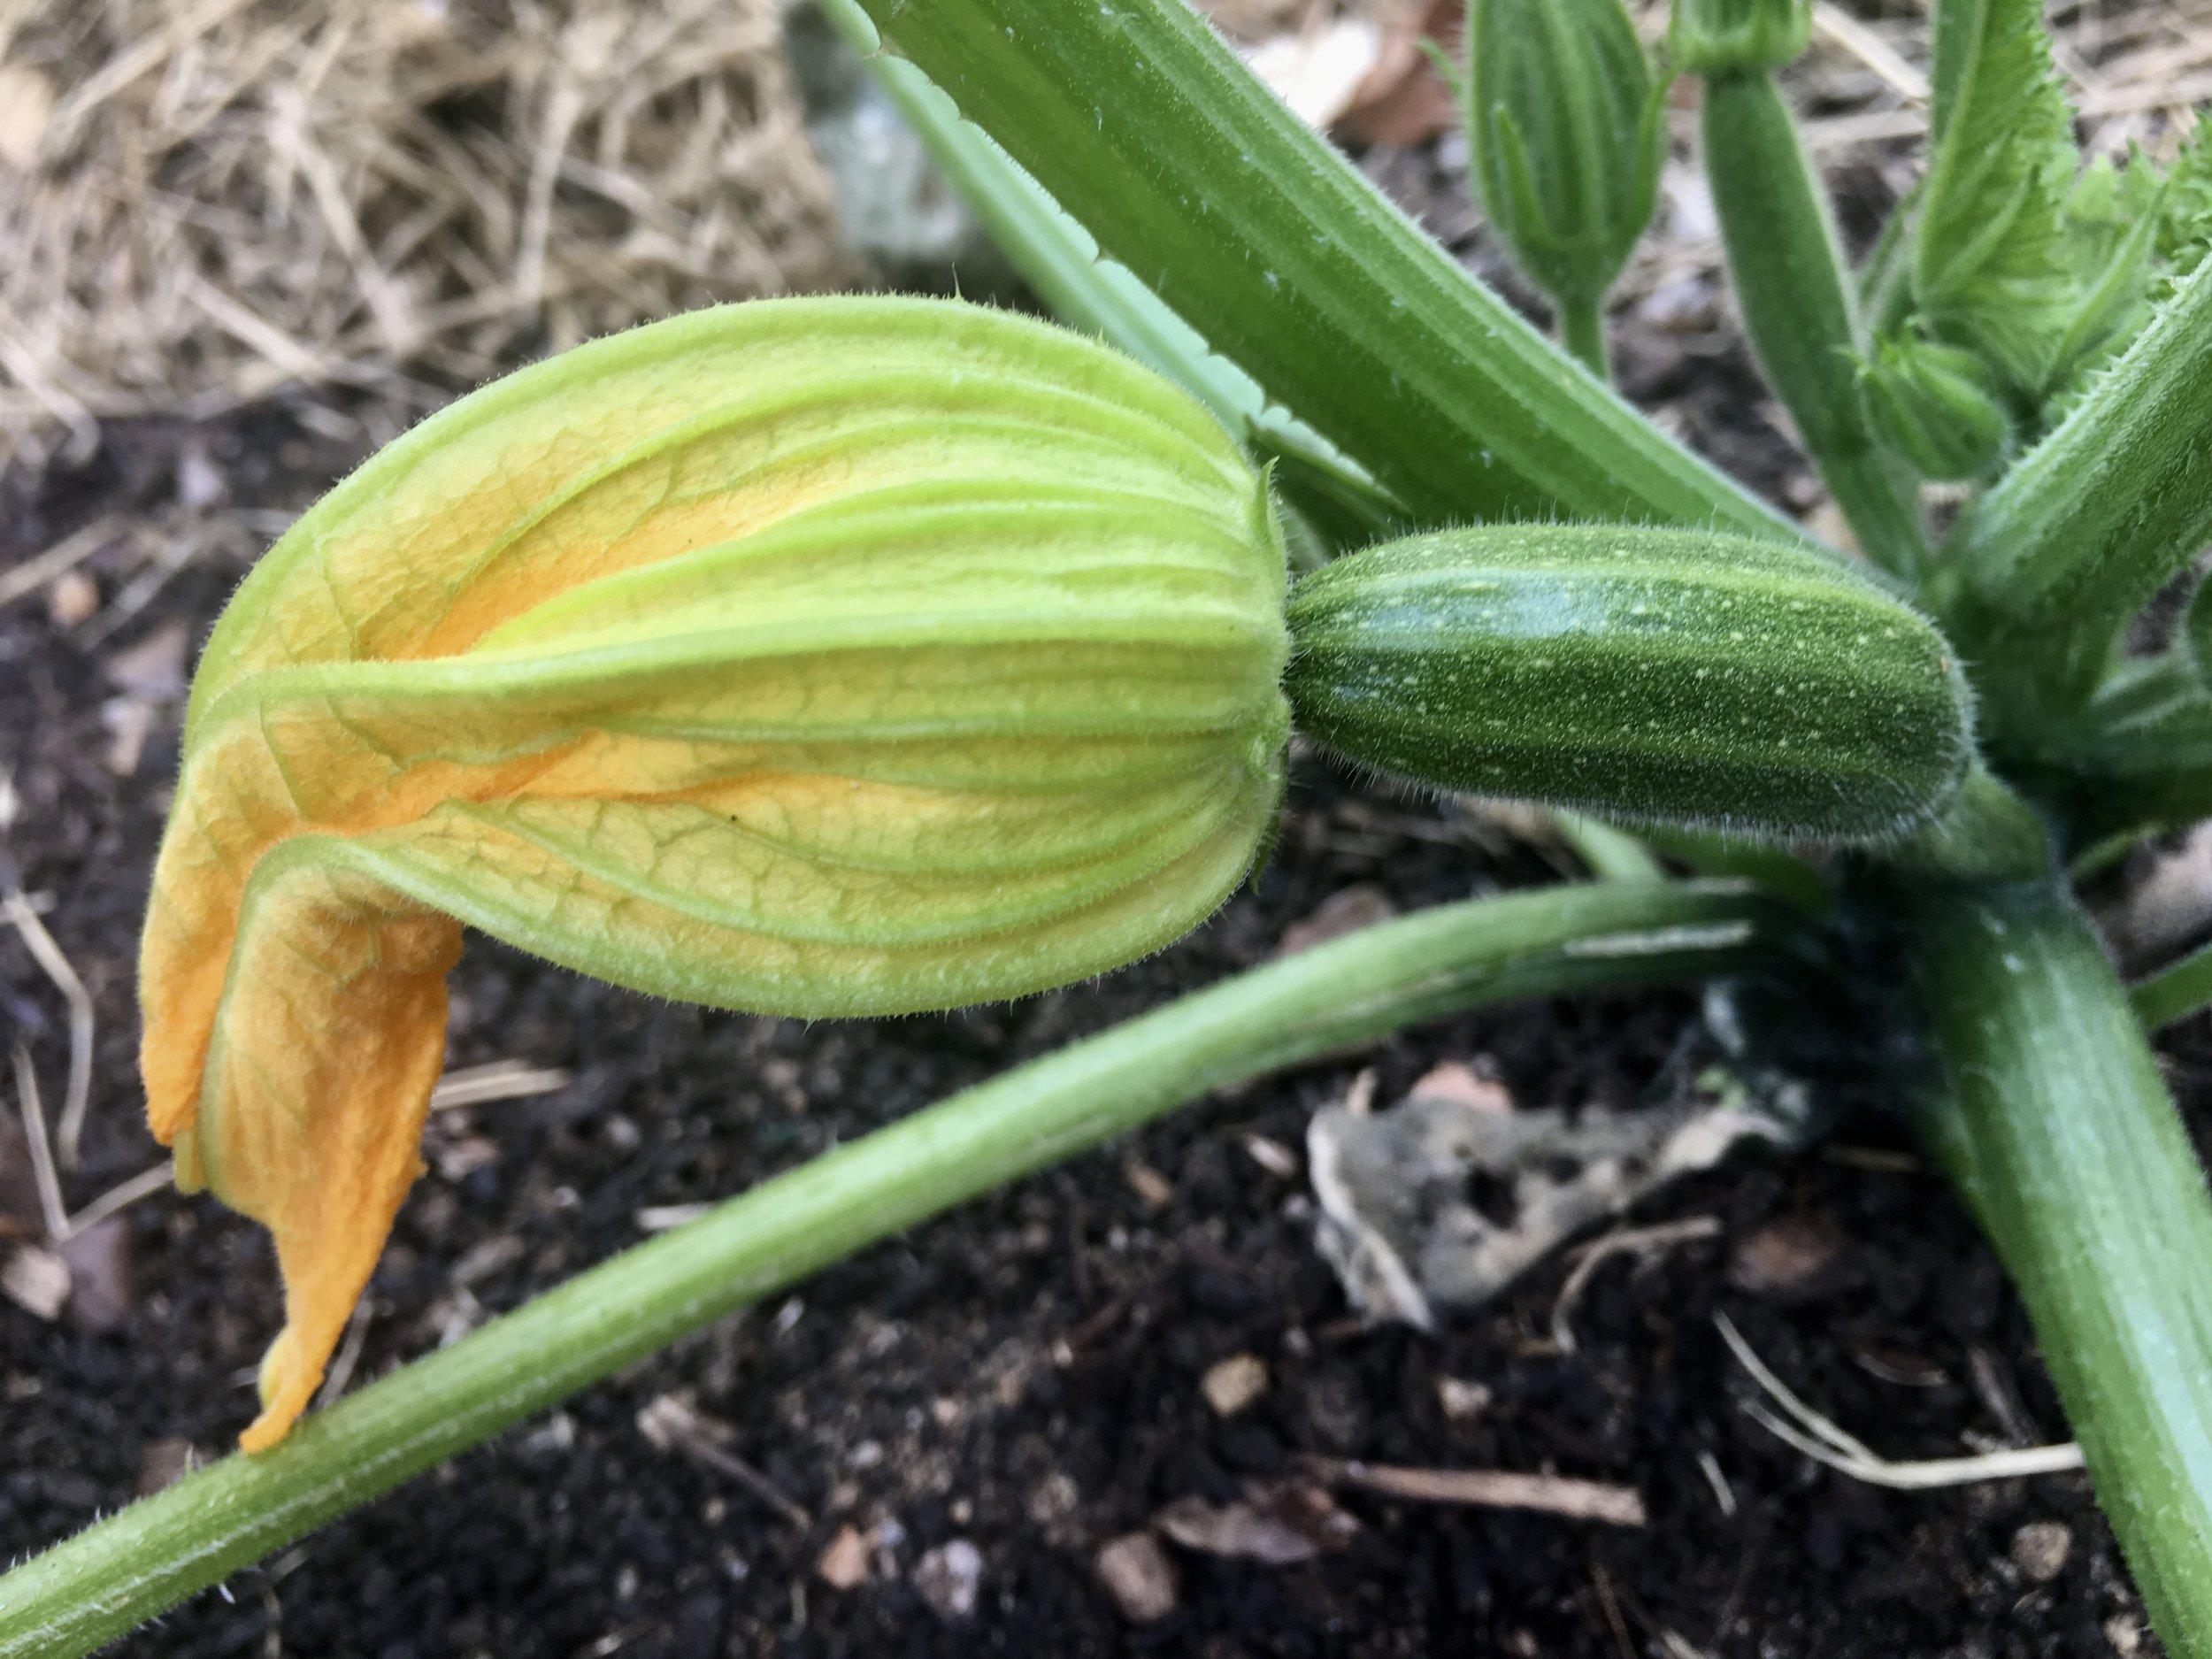 The first zucchini.